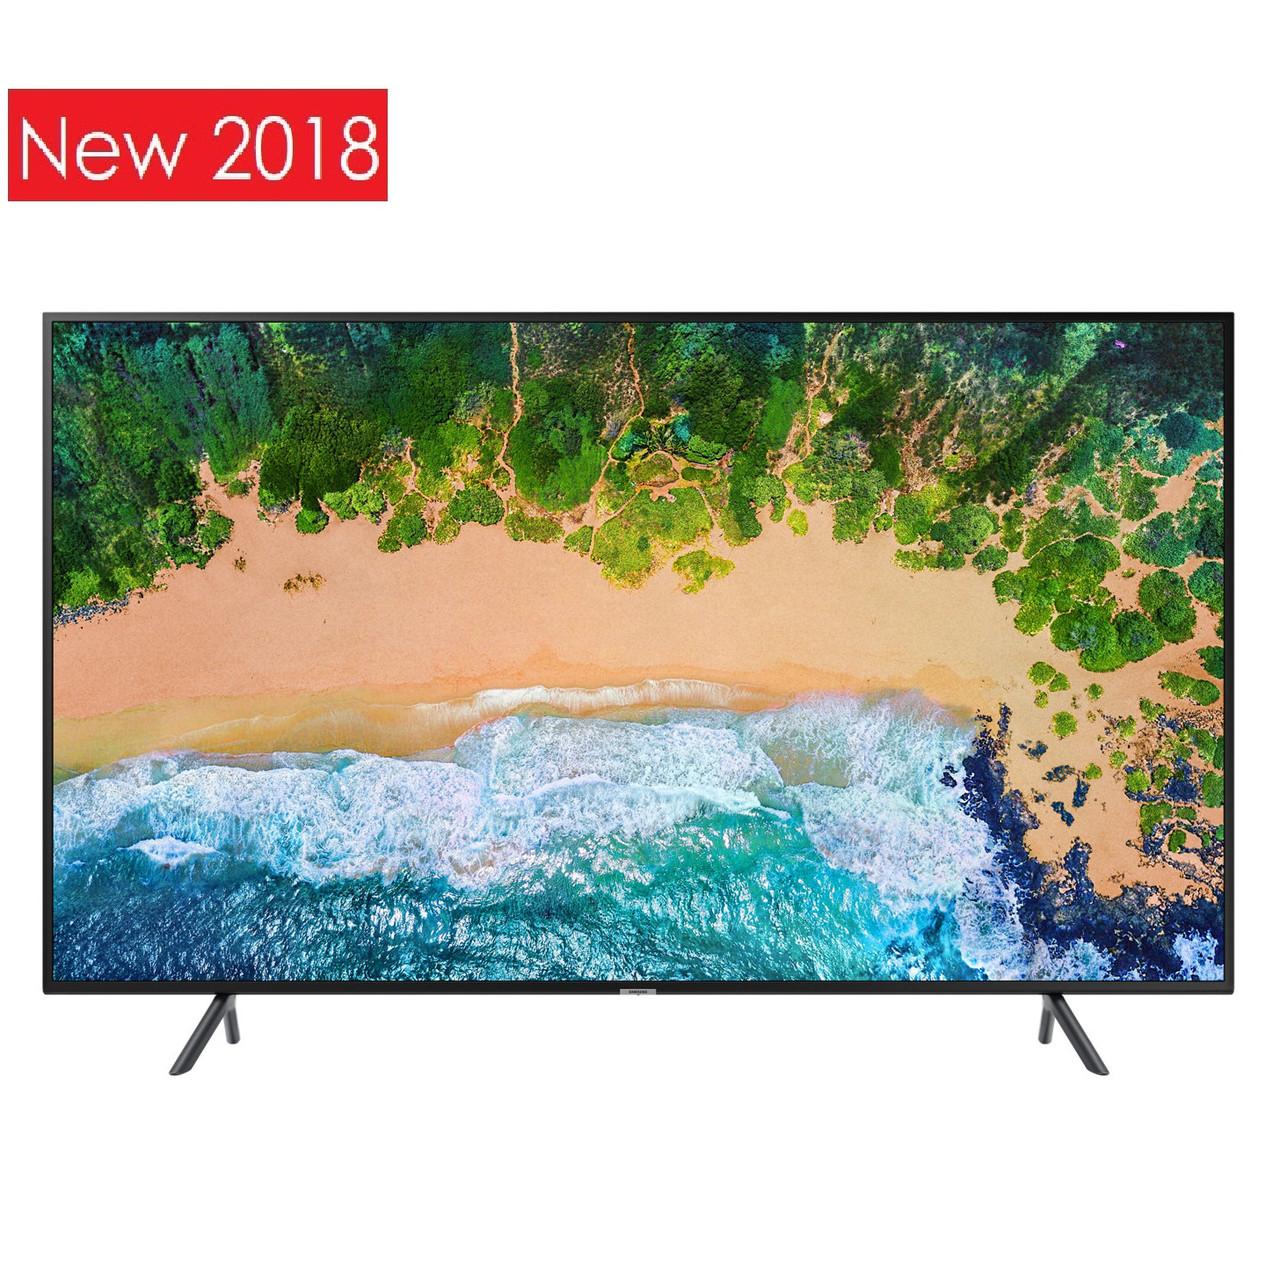 Телевизор Samsung UE55NU7102 (PQI 1300Гц, UltraHD HDR10, Smart, Tizen 4.0, DVB-C/T2)